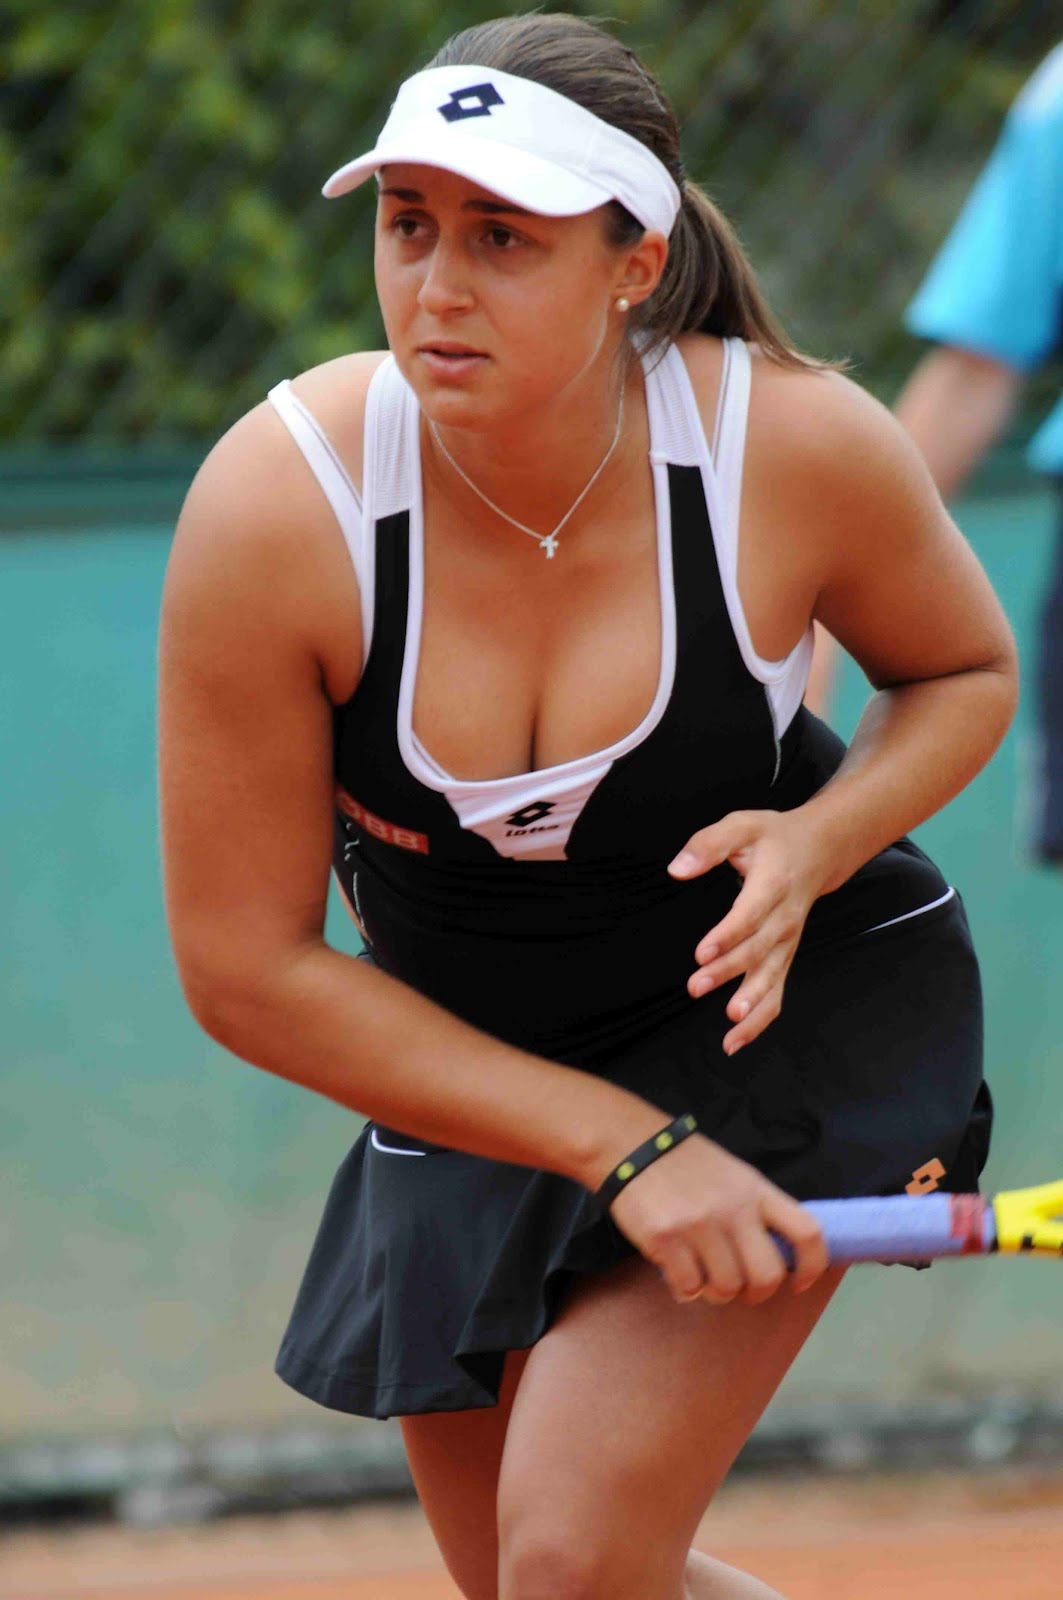 PLAYER PICTURE: tanes player Tamira Paszek